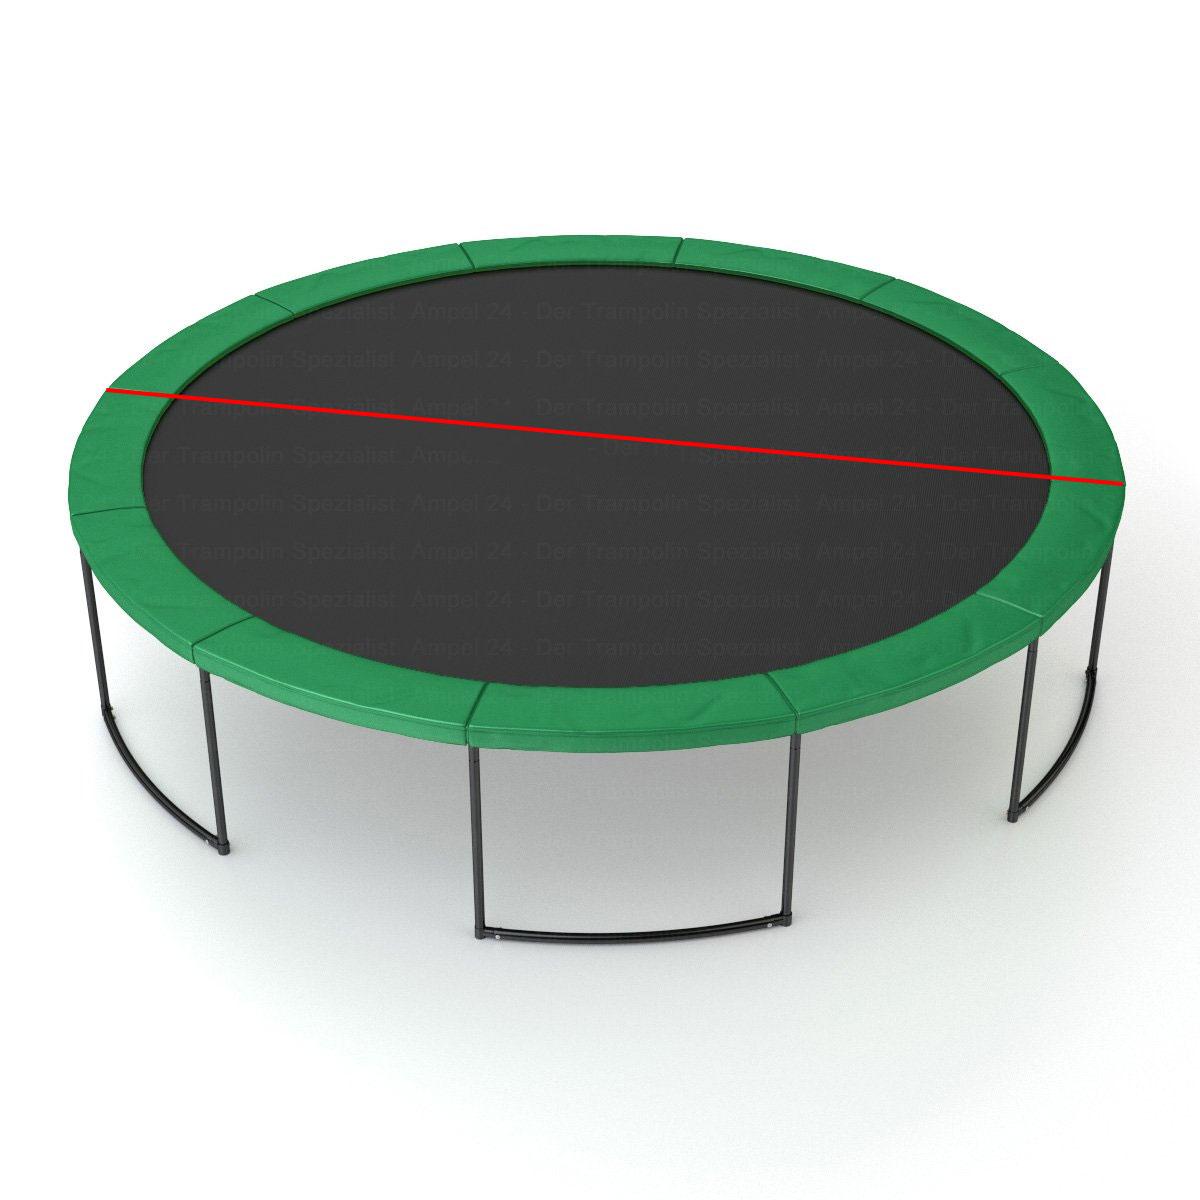 Sådan måles bredde på trampolinen